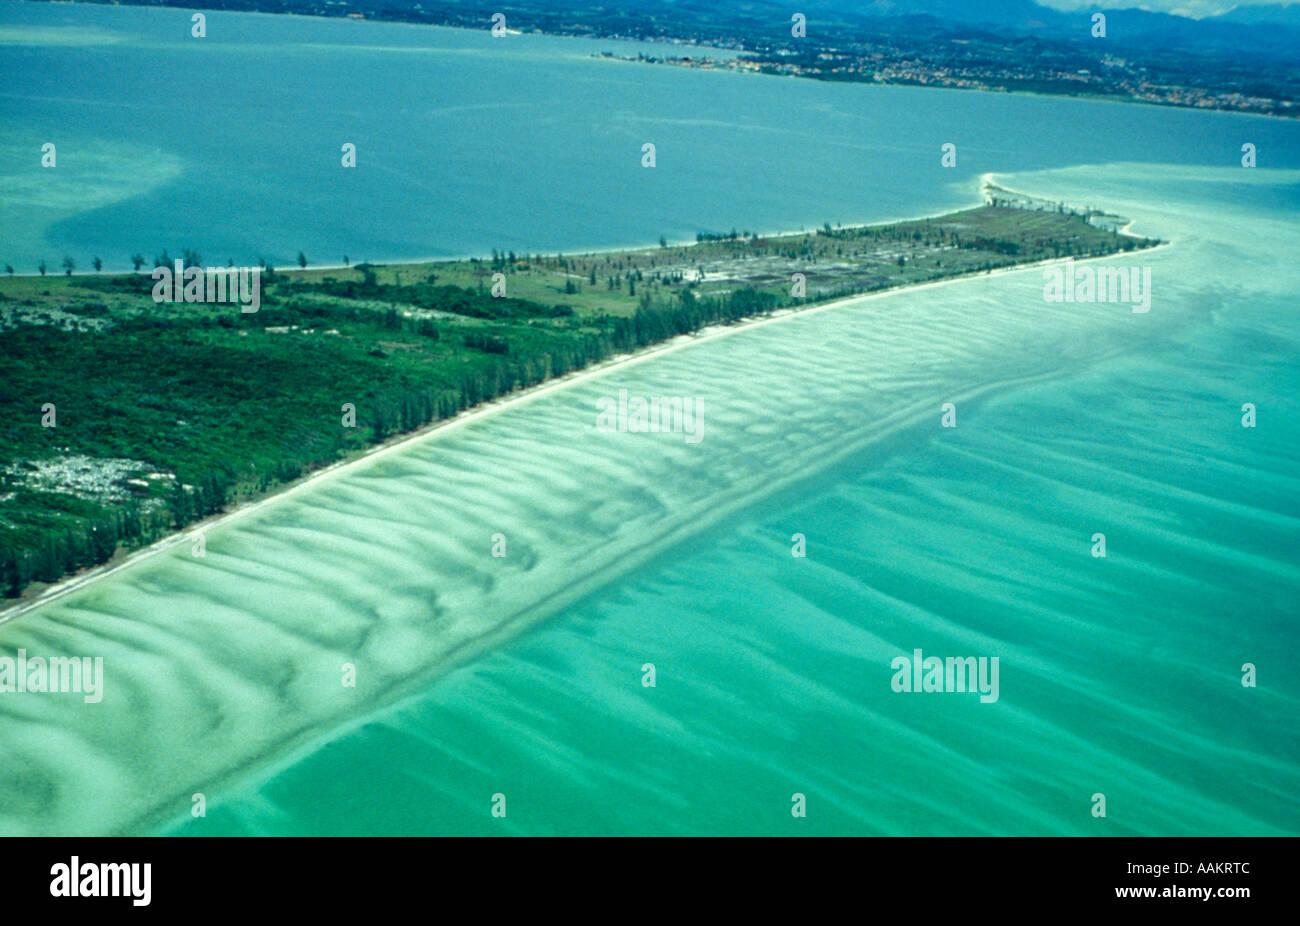 Geographie - Sandbank (Restinga) - Ponta Acaíra - Cabo Frio, Bundesstaat Rio De Janeiro, Brasilien. Stockbild